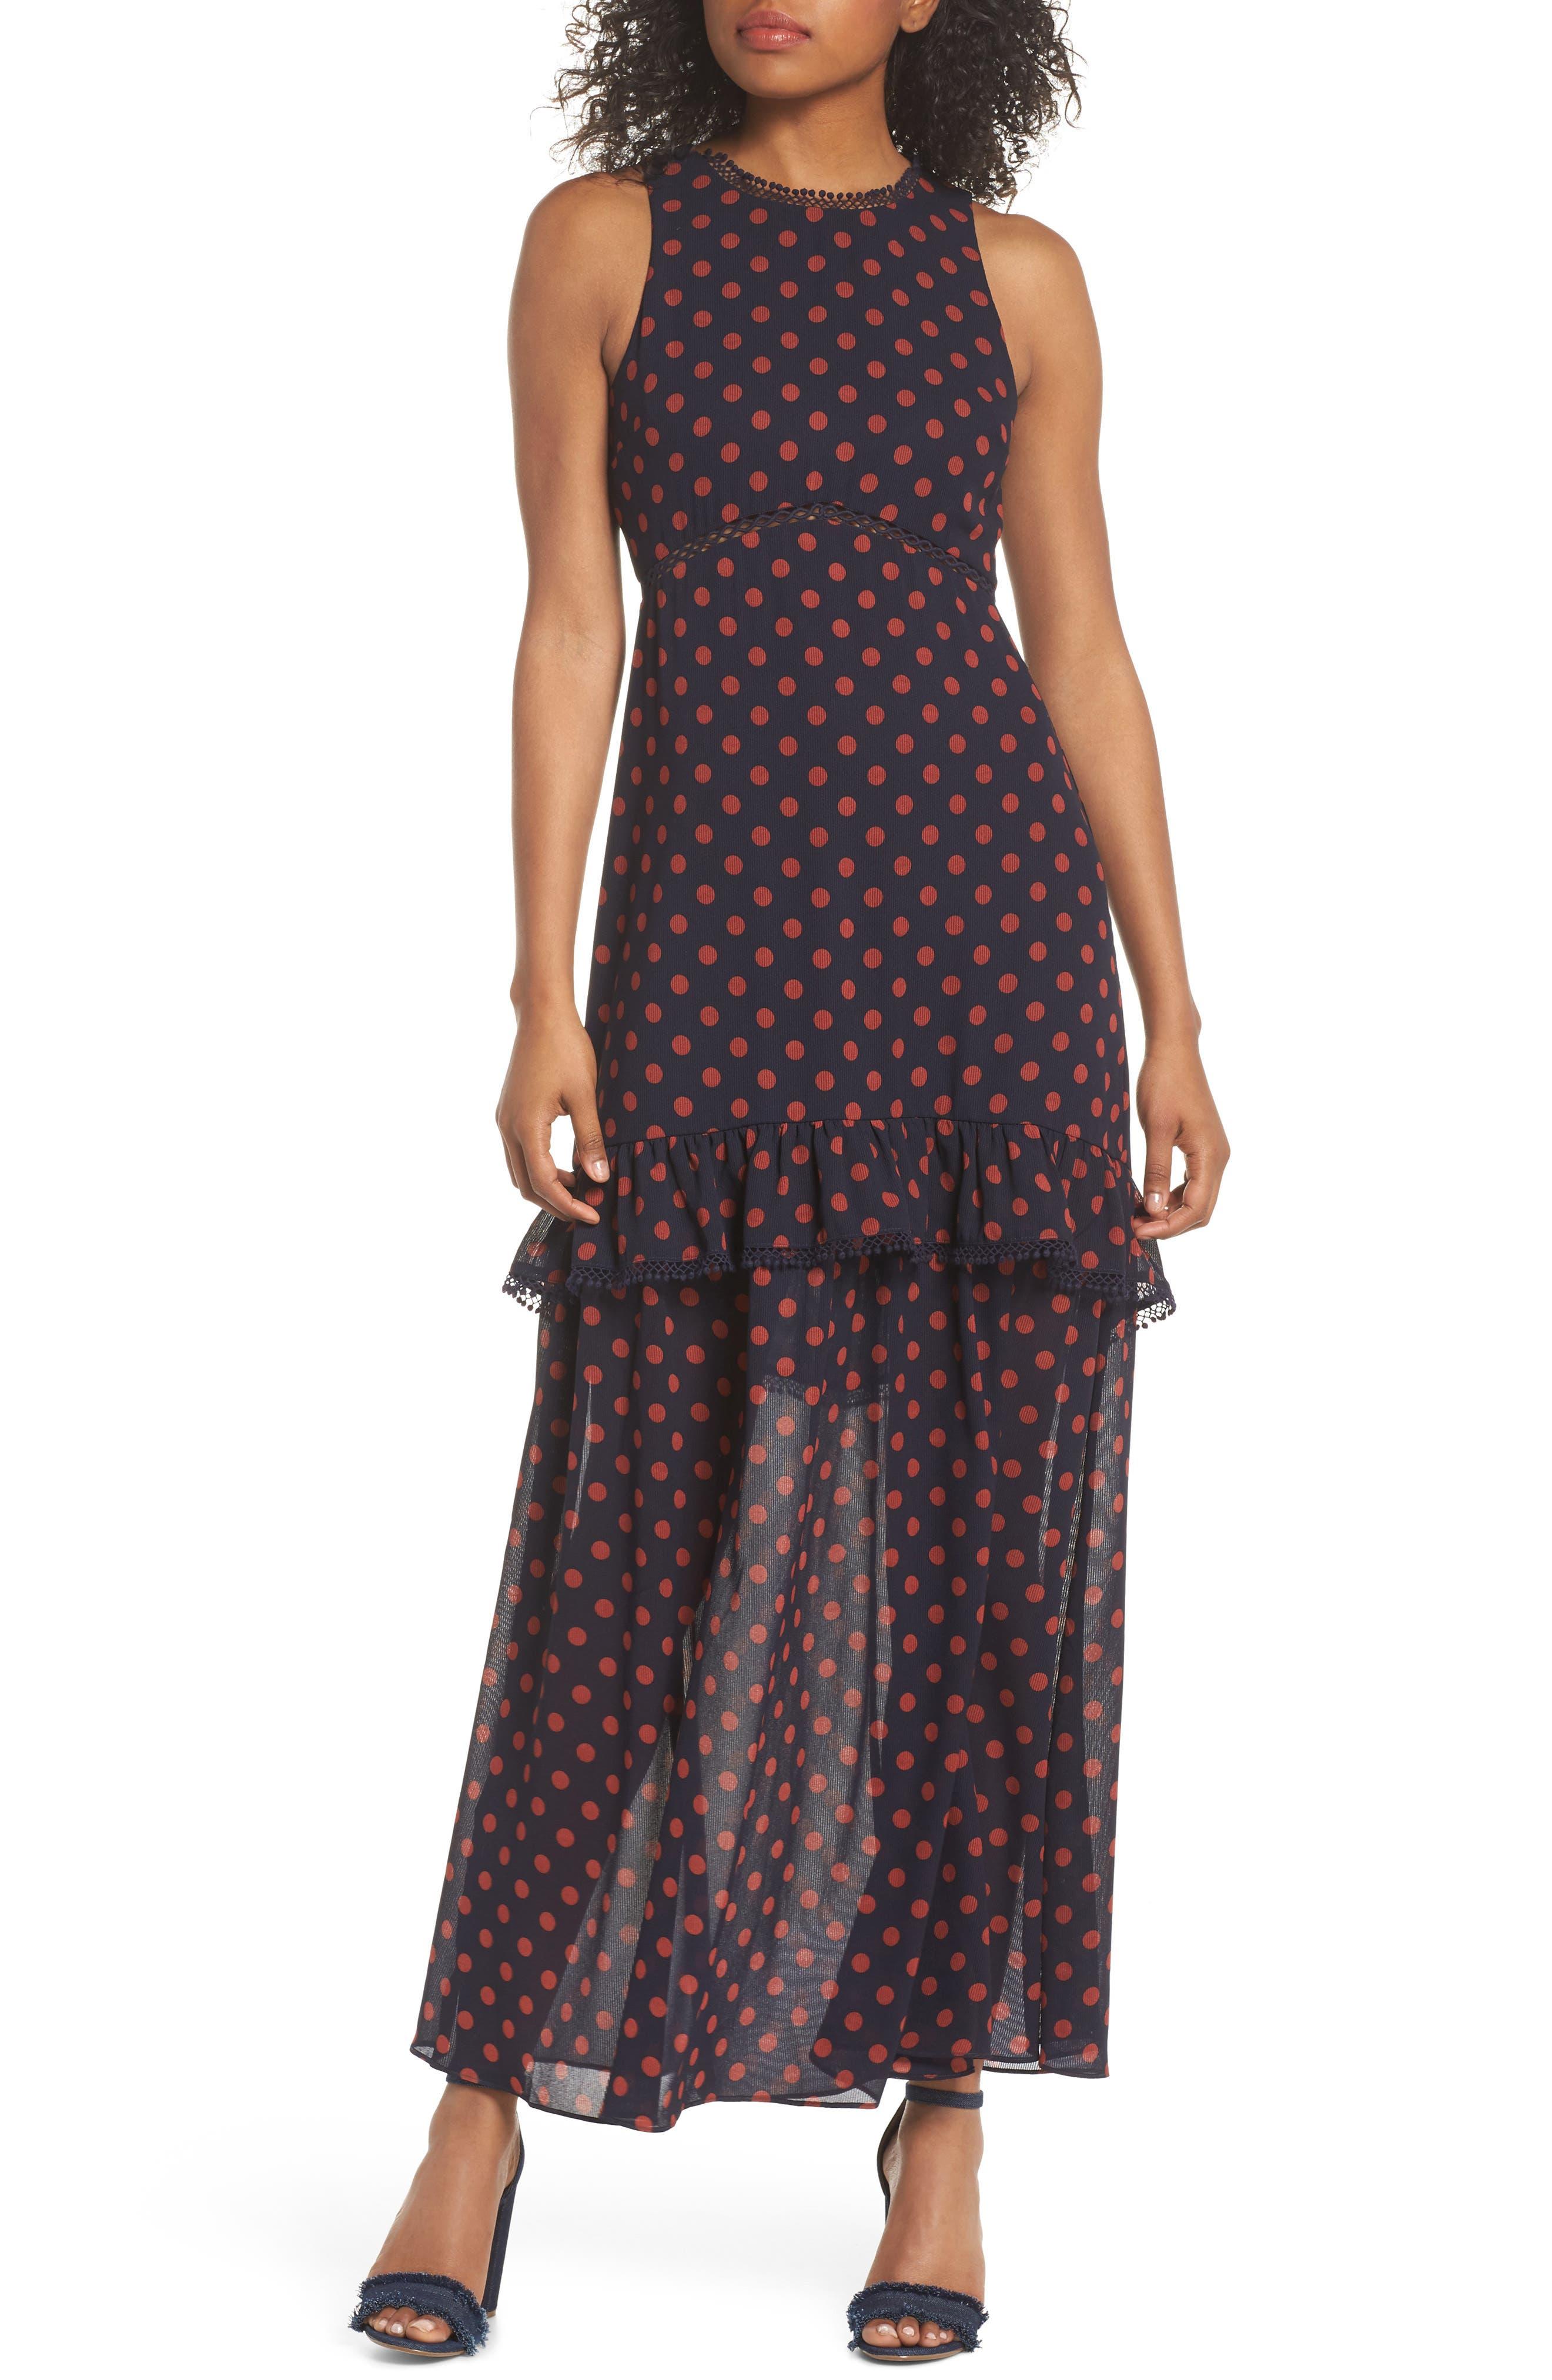 NSR Dot Ruffle Maxi Dress